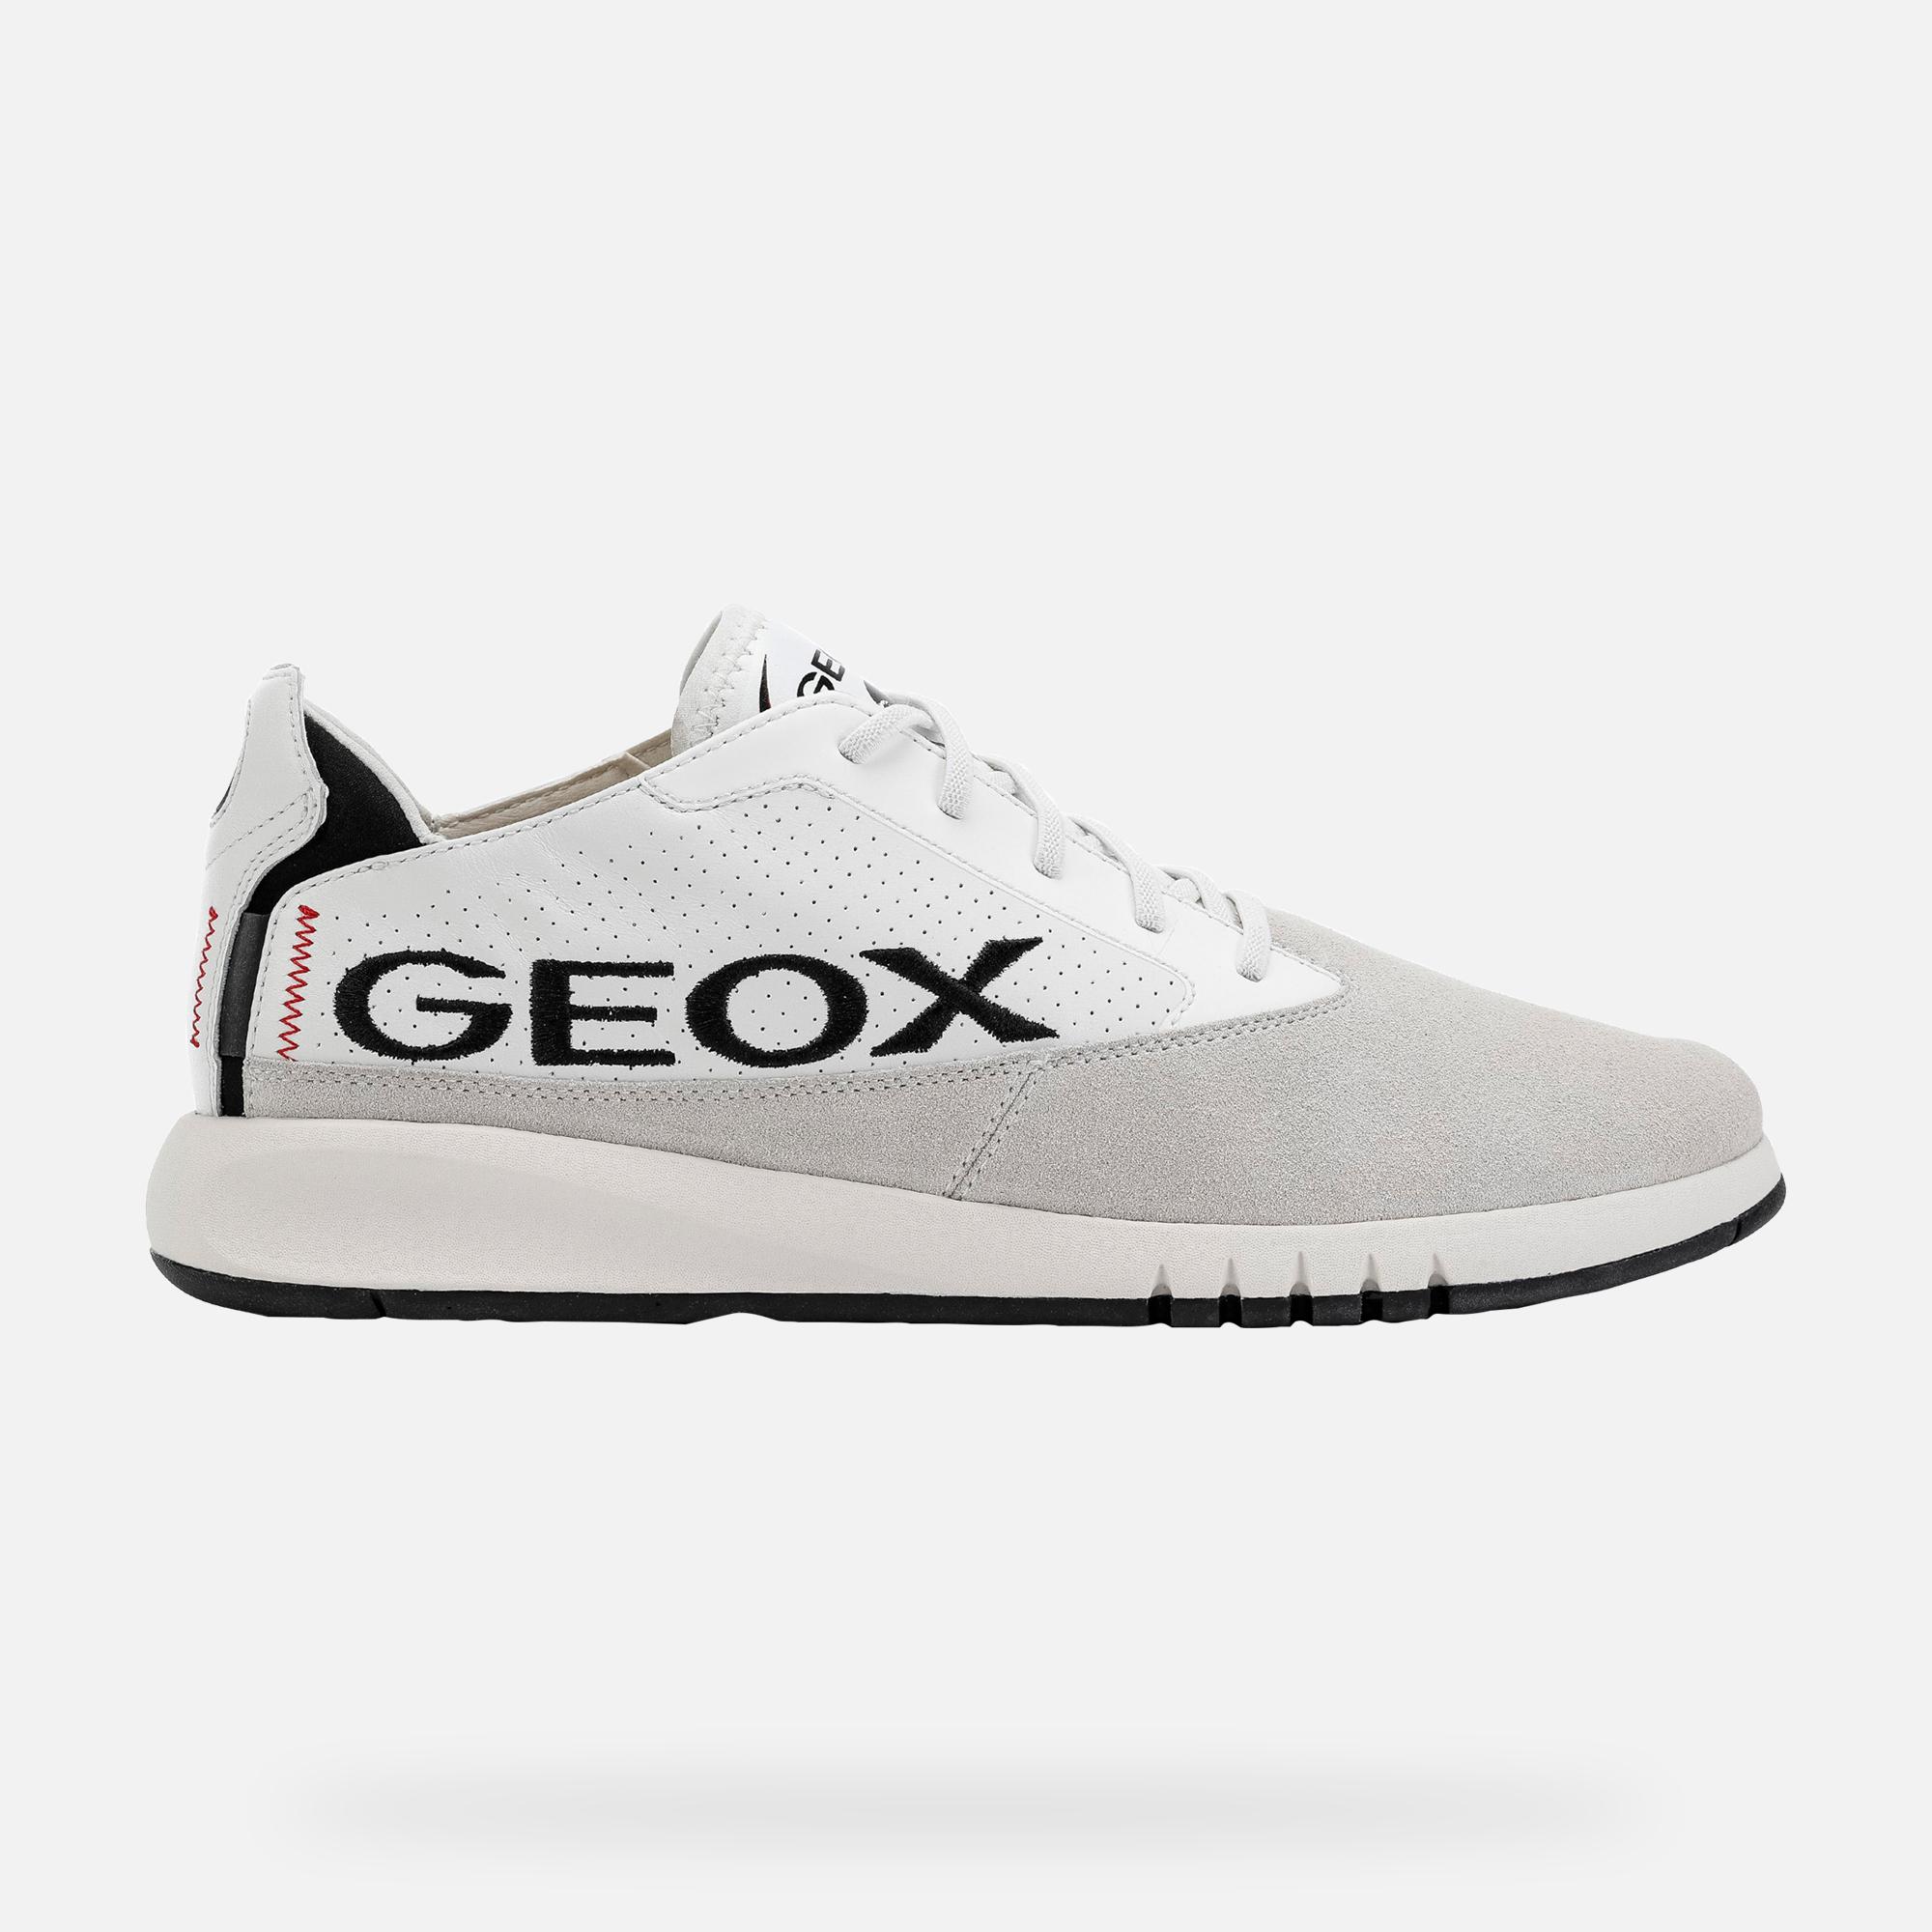 AERANTIS GEOX DRAGON from men | Geox